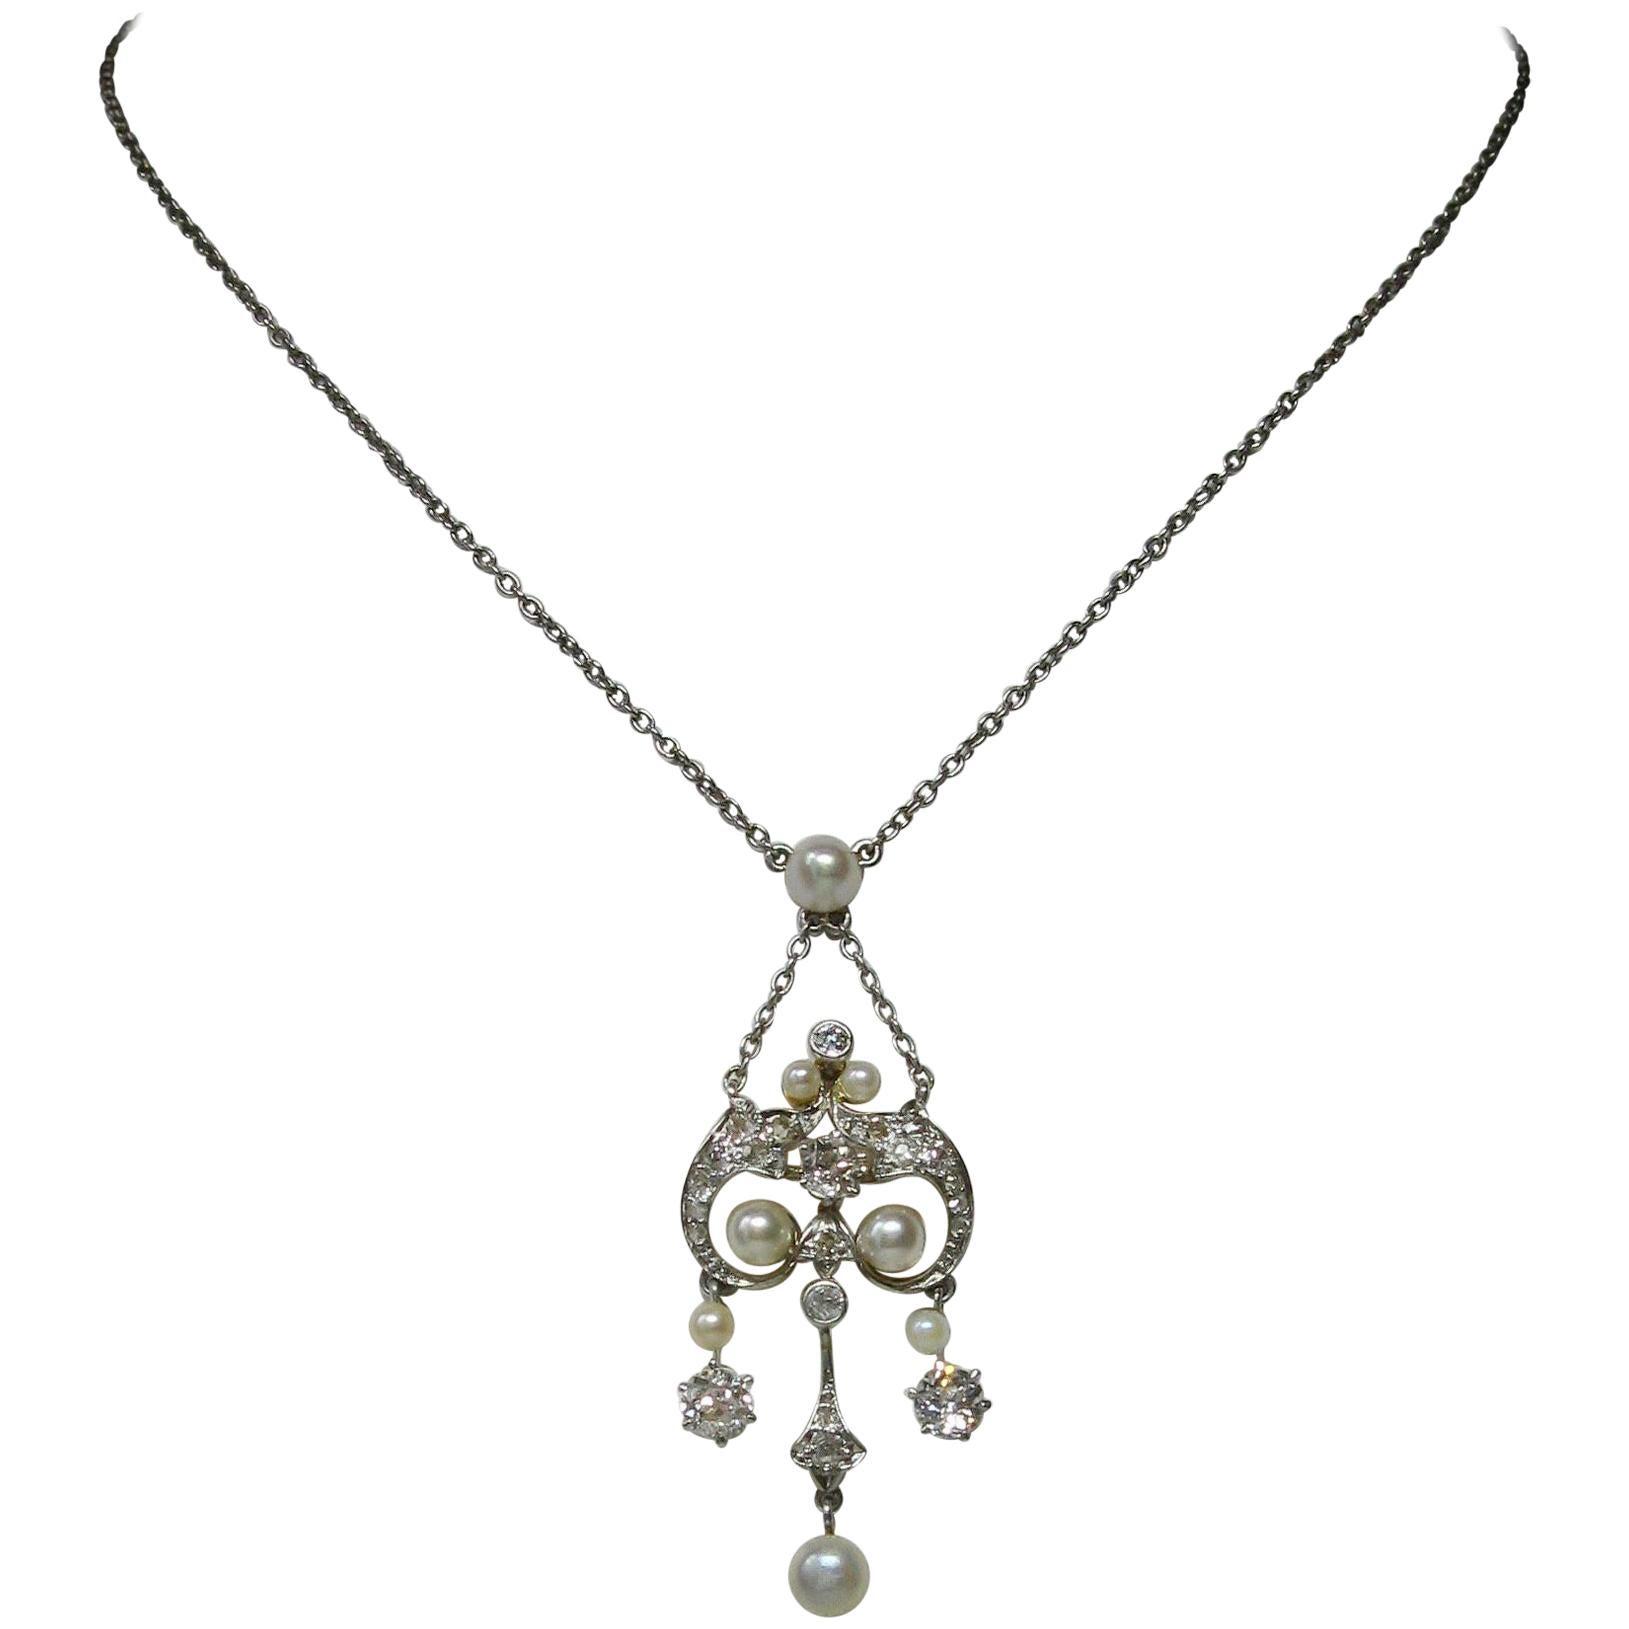 Edwardian Diamond Platinum Pearl Pendant Necklace Victorian, circa 1900